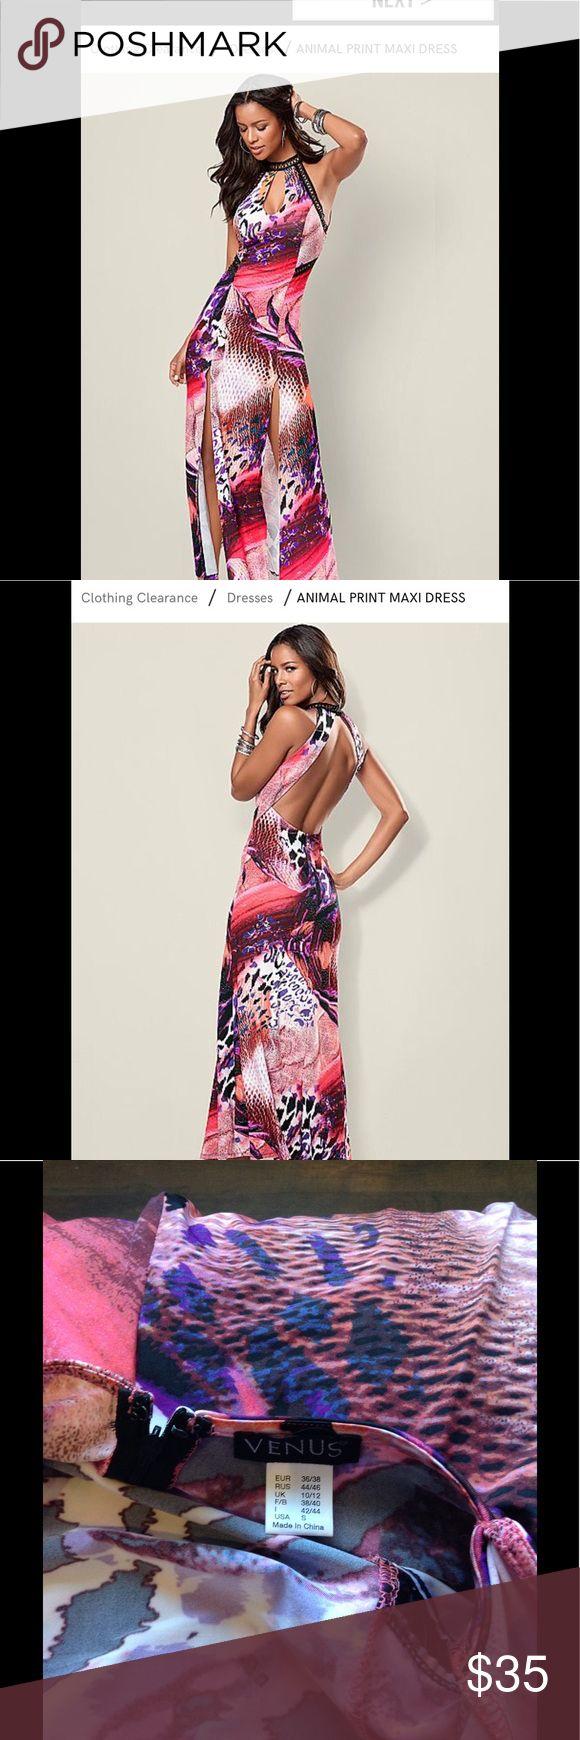 Venus animal print maxi dress Venus maxi animal print dress.  Open back   Has 2 slits in front to give it that sexy fun look.  Size small.   NWOT VENUS Dresses Maxi